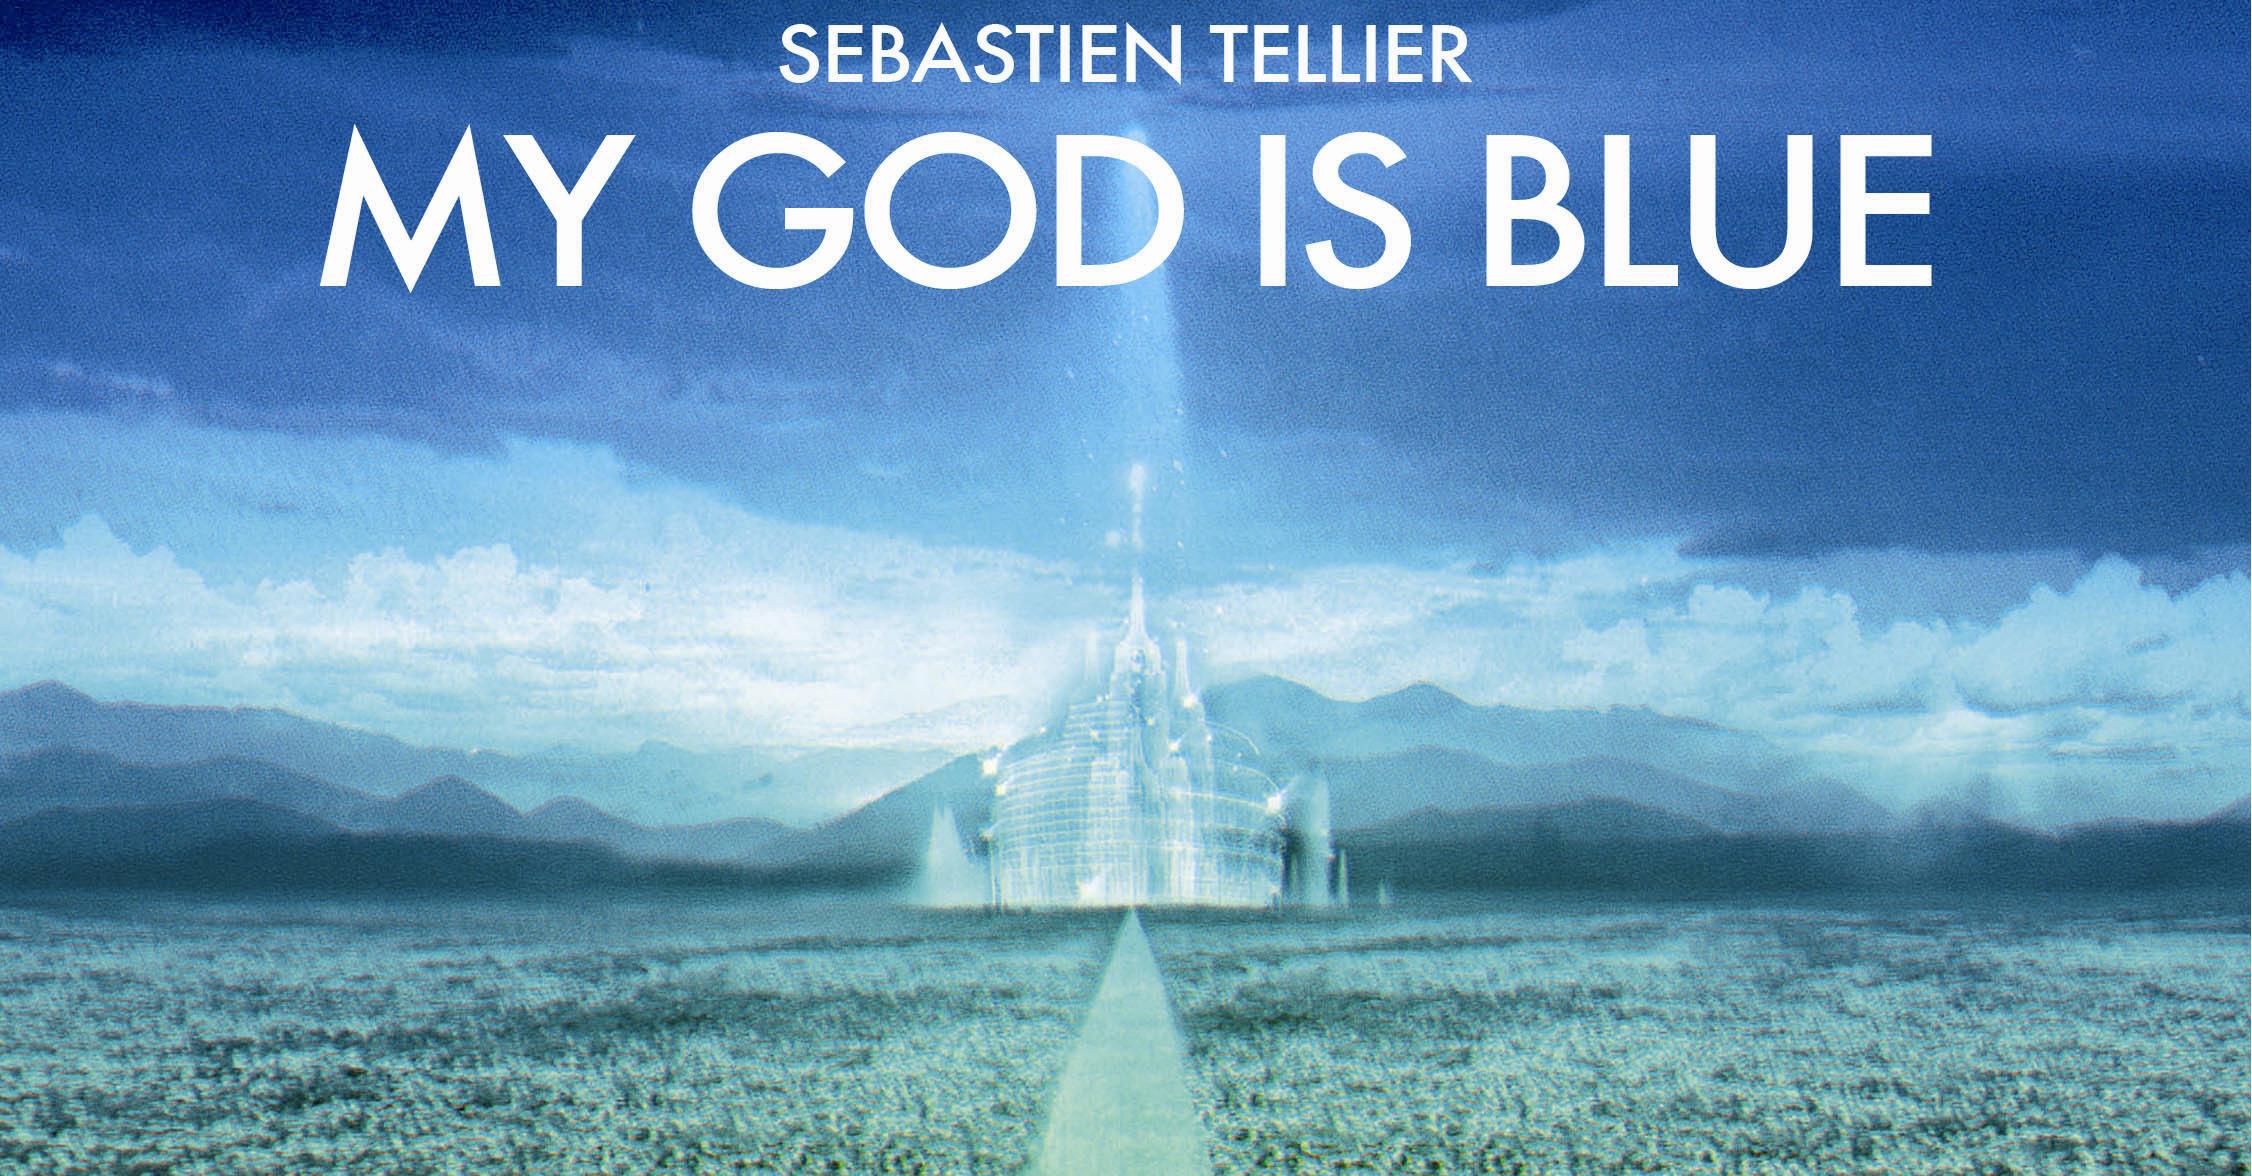 Sébastian Telliers blauer Gott …